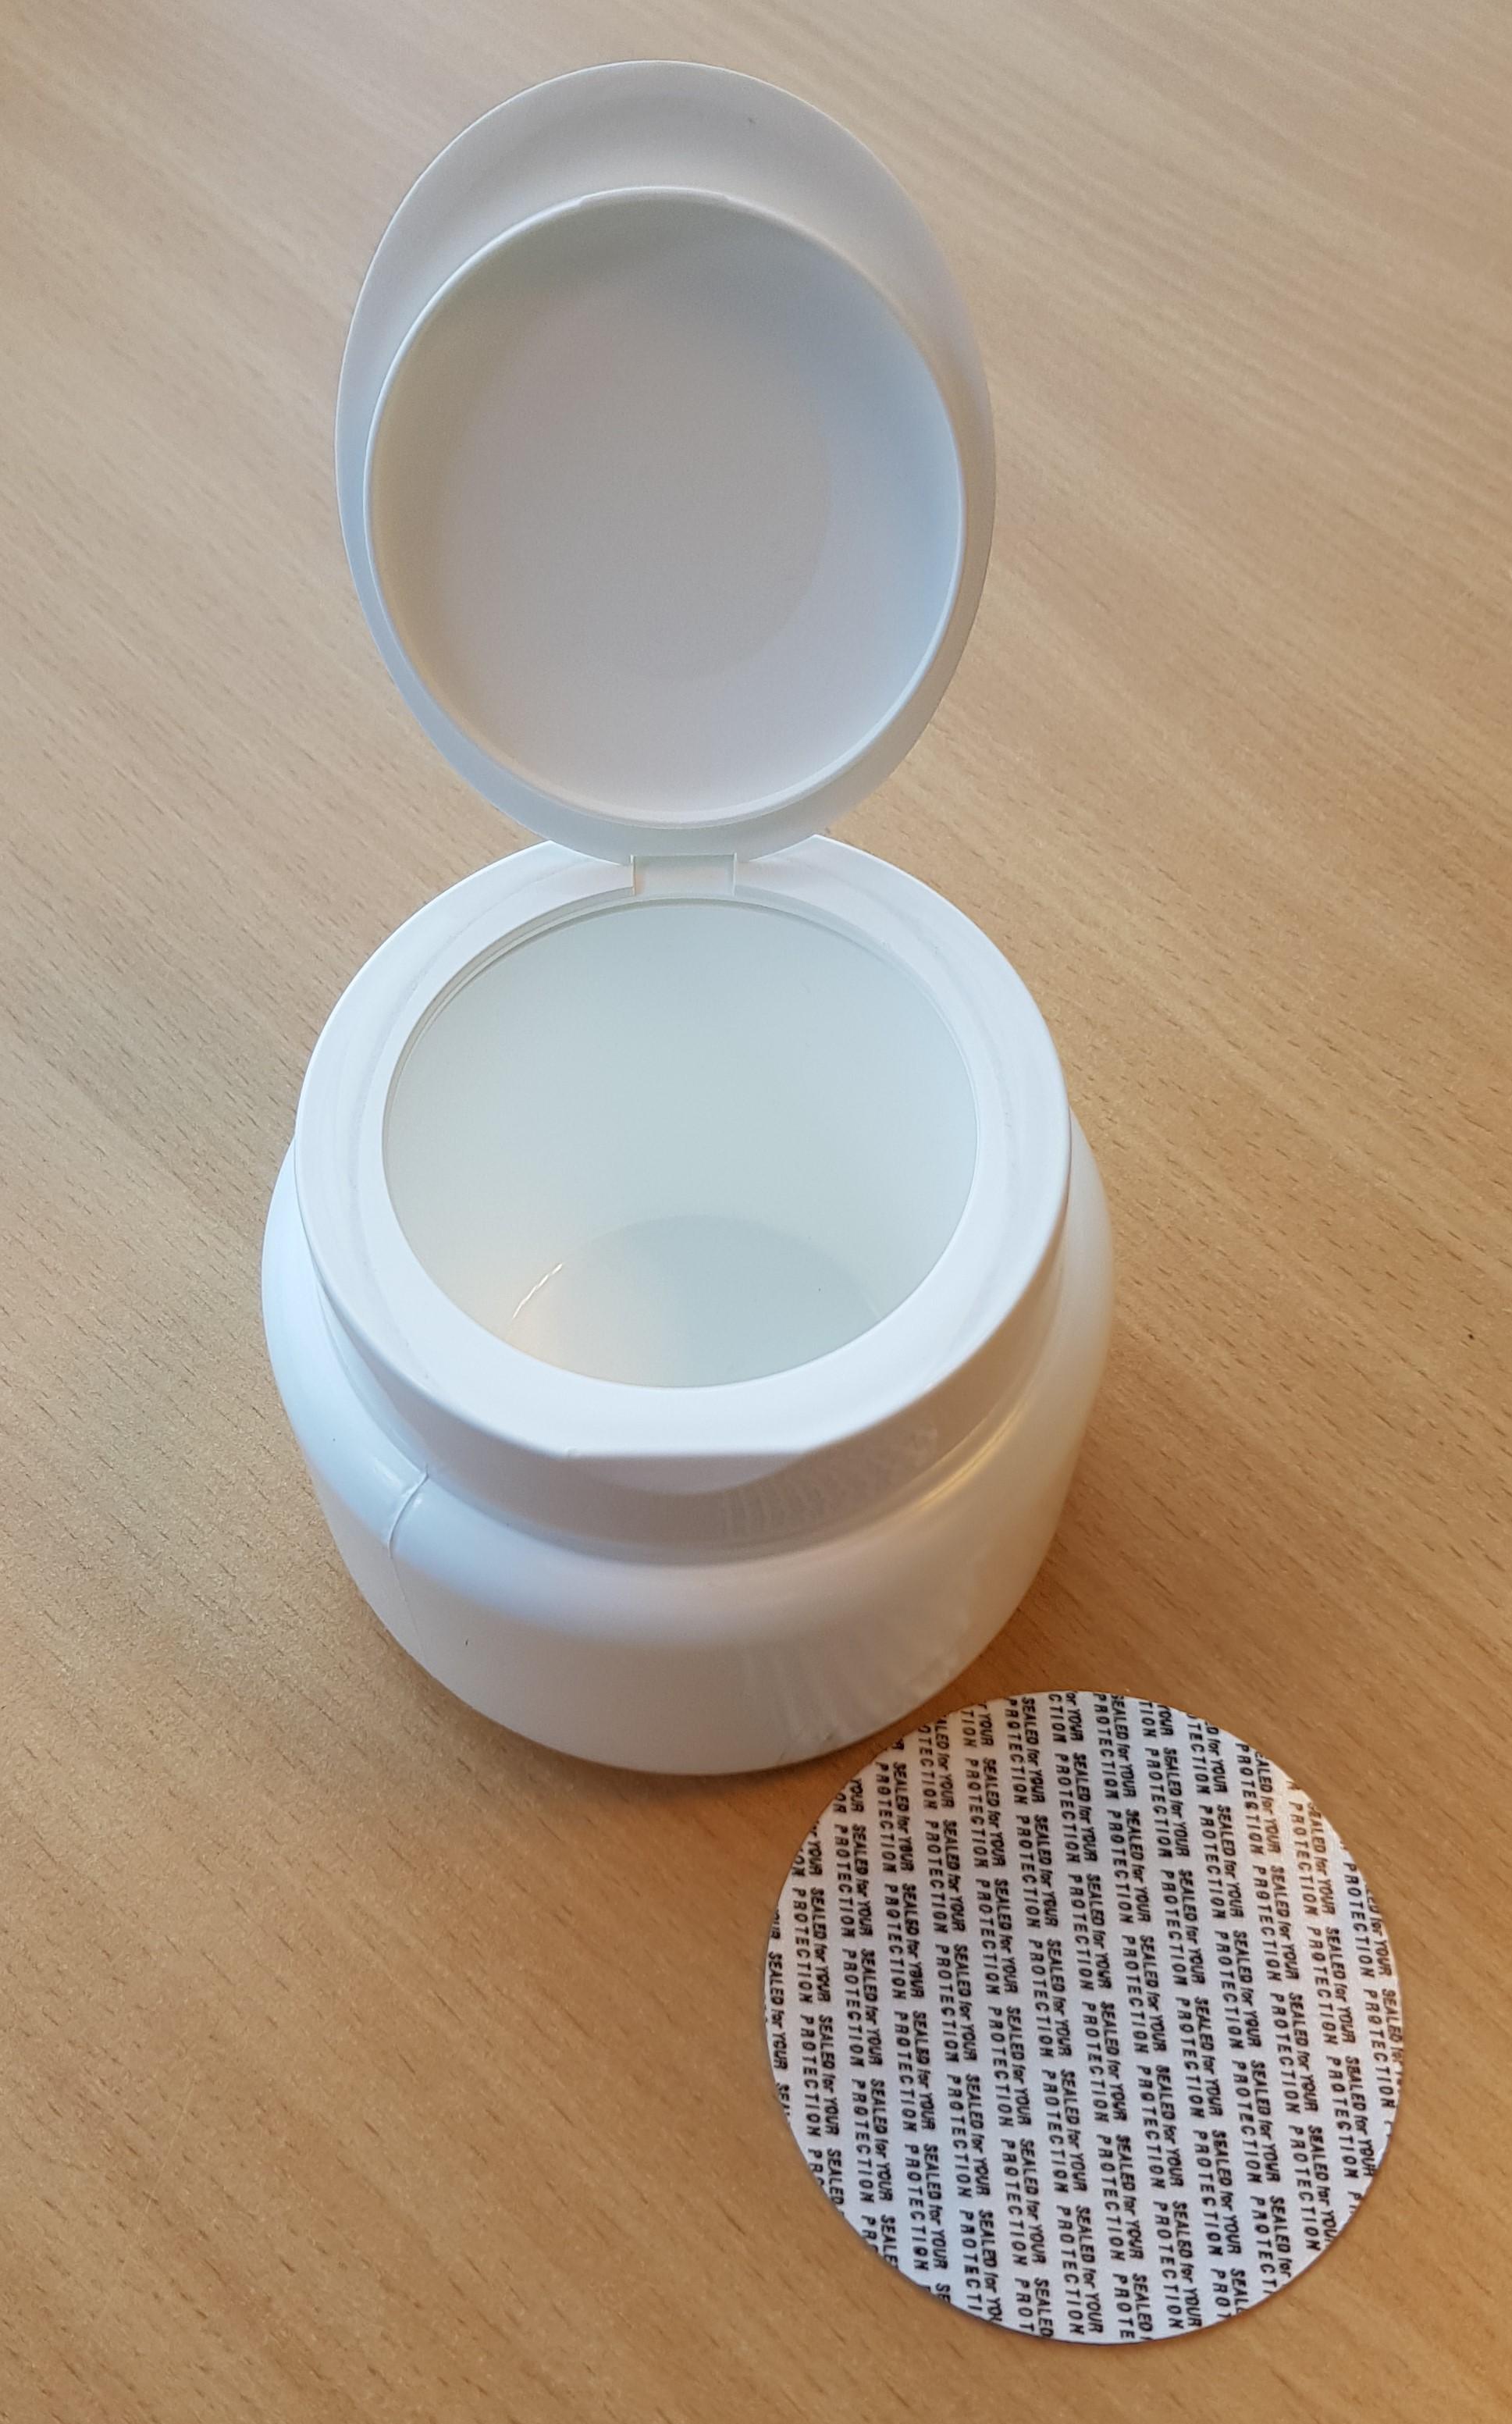 Salonpotten inhoud 250ml met led afsluiting en binnenpot met klep deksel